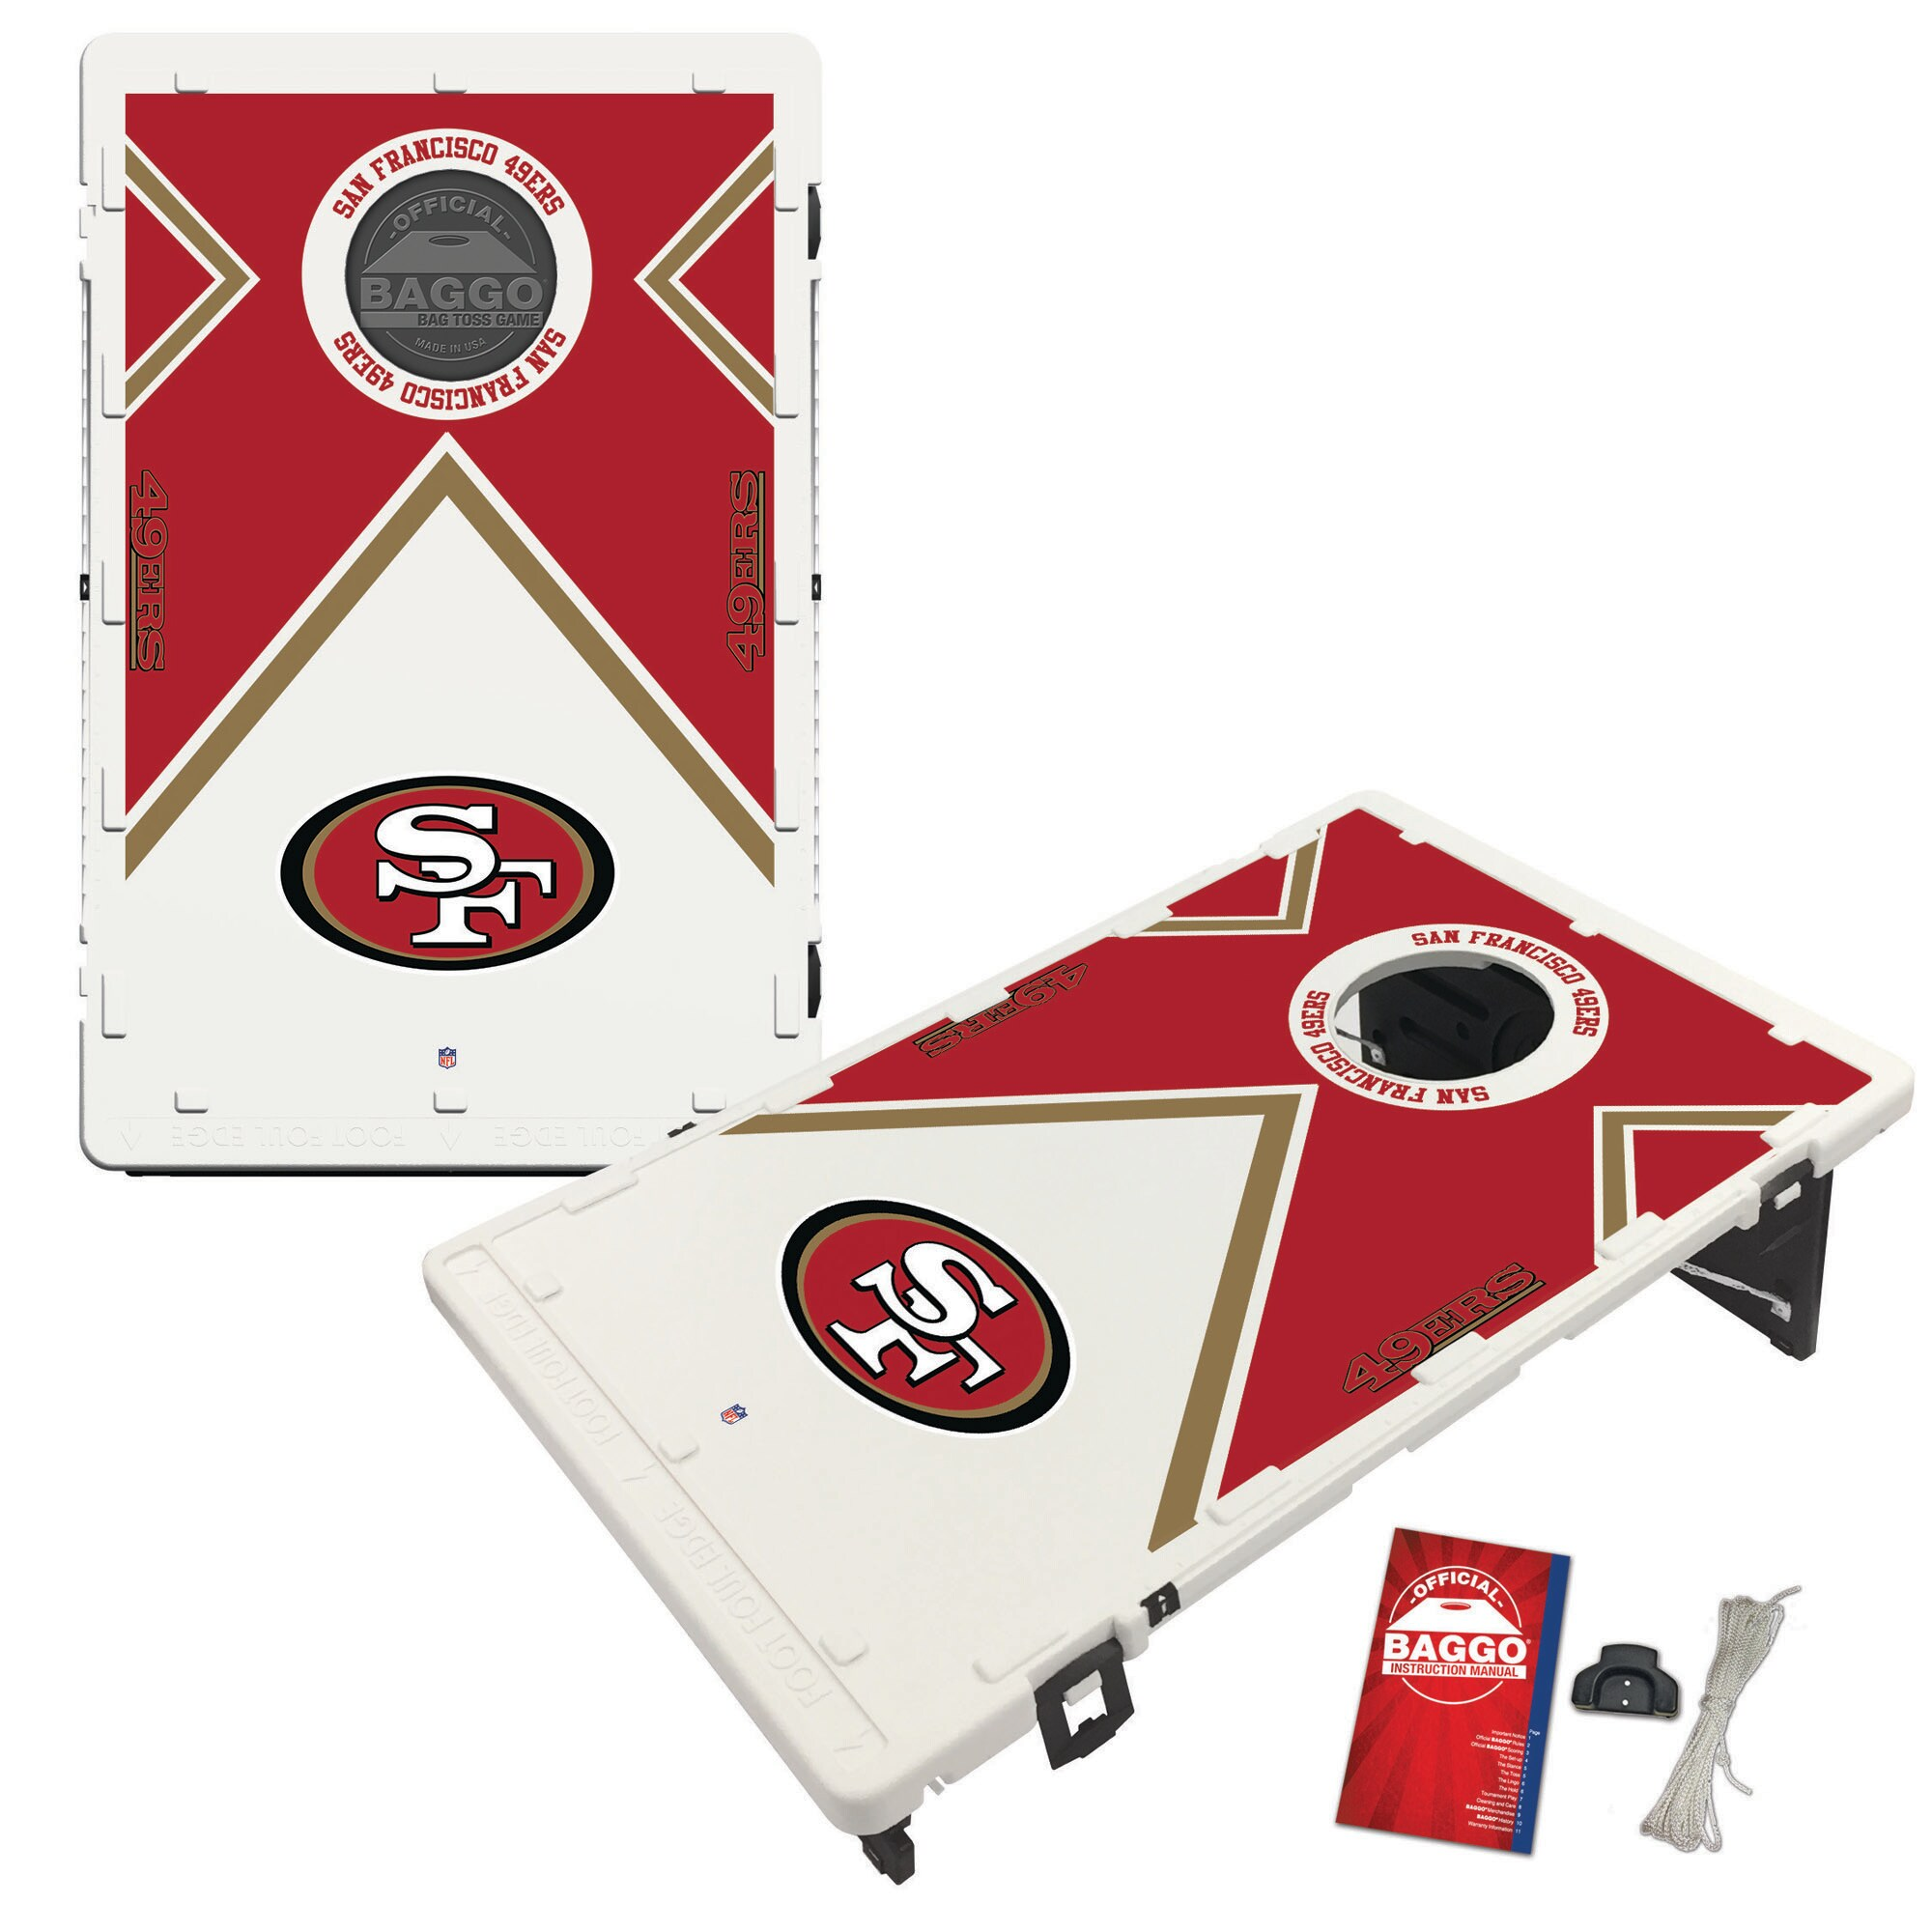 San Francisco 49ers 2' x 3' BAGGO Vintage Cornhole Board Tailgate Toss Set